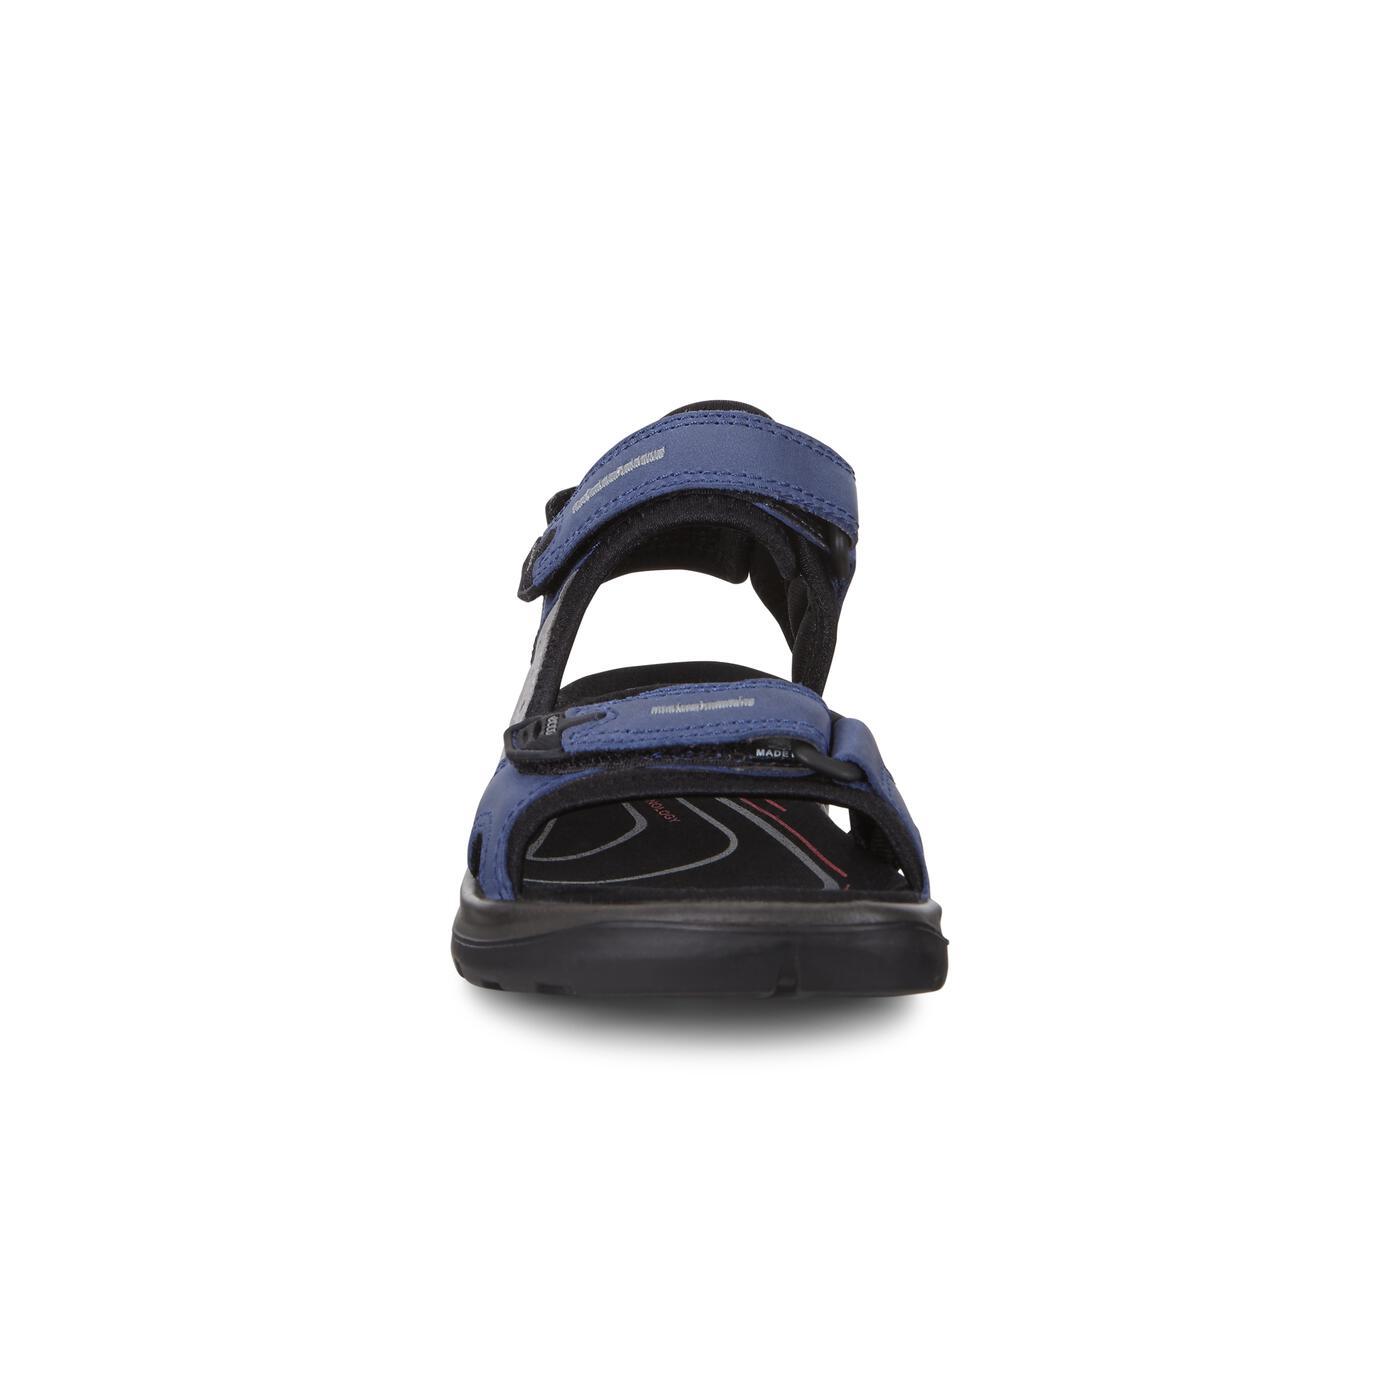 ECCO OFFROAD Womens Sports Sandal